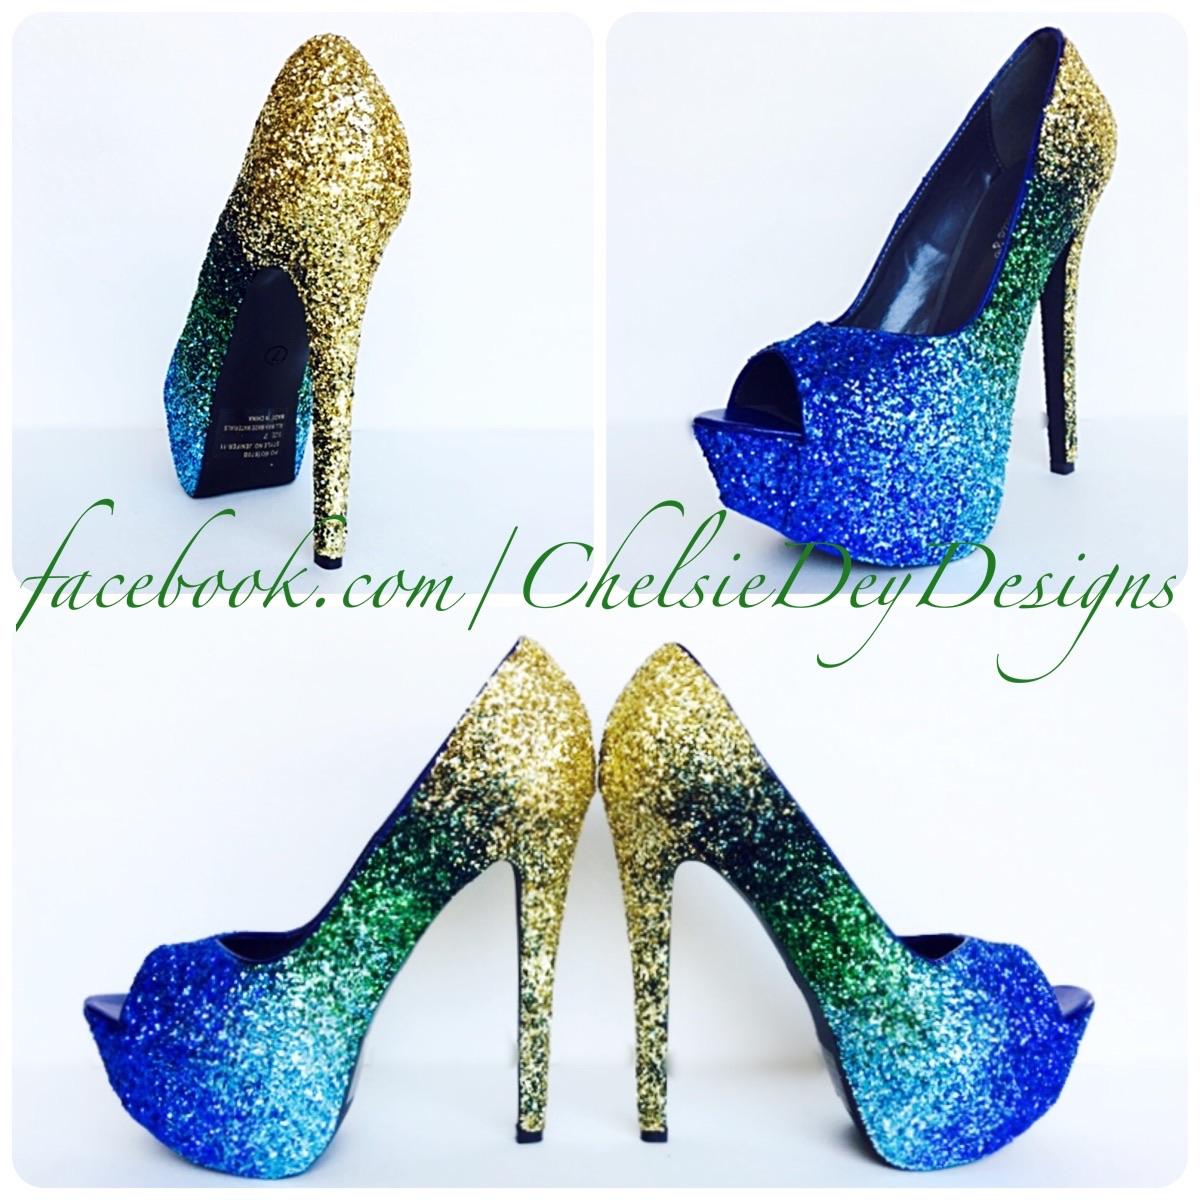 2dc9e289717 Peacock Glitter High Heels - Gold Green Royal Blue Light Blue Ombre Pumps -  Peacock Feather Wedding Peep Toe Shoes - Platform Open Toe Prom Pumps on ...